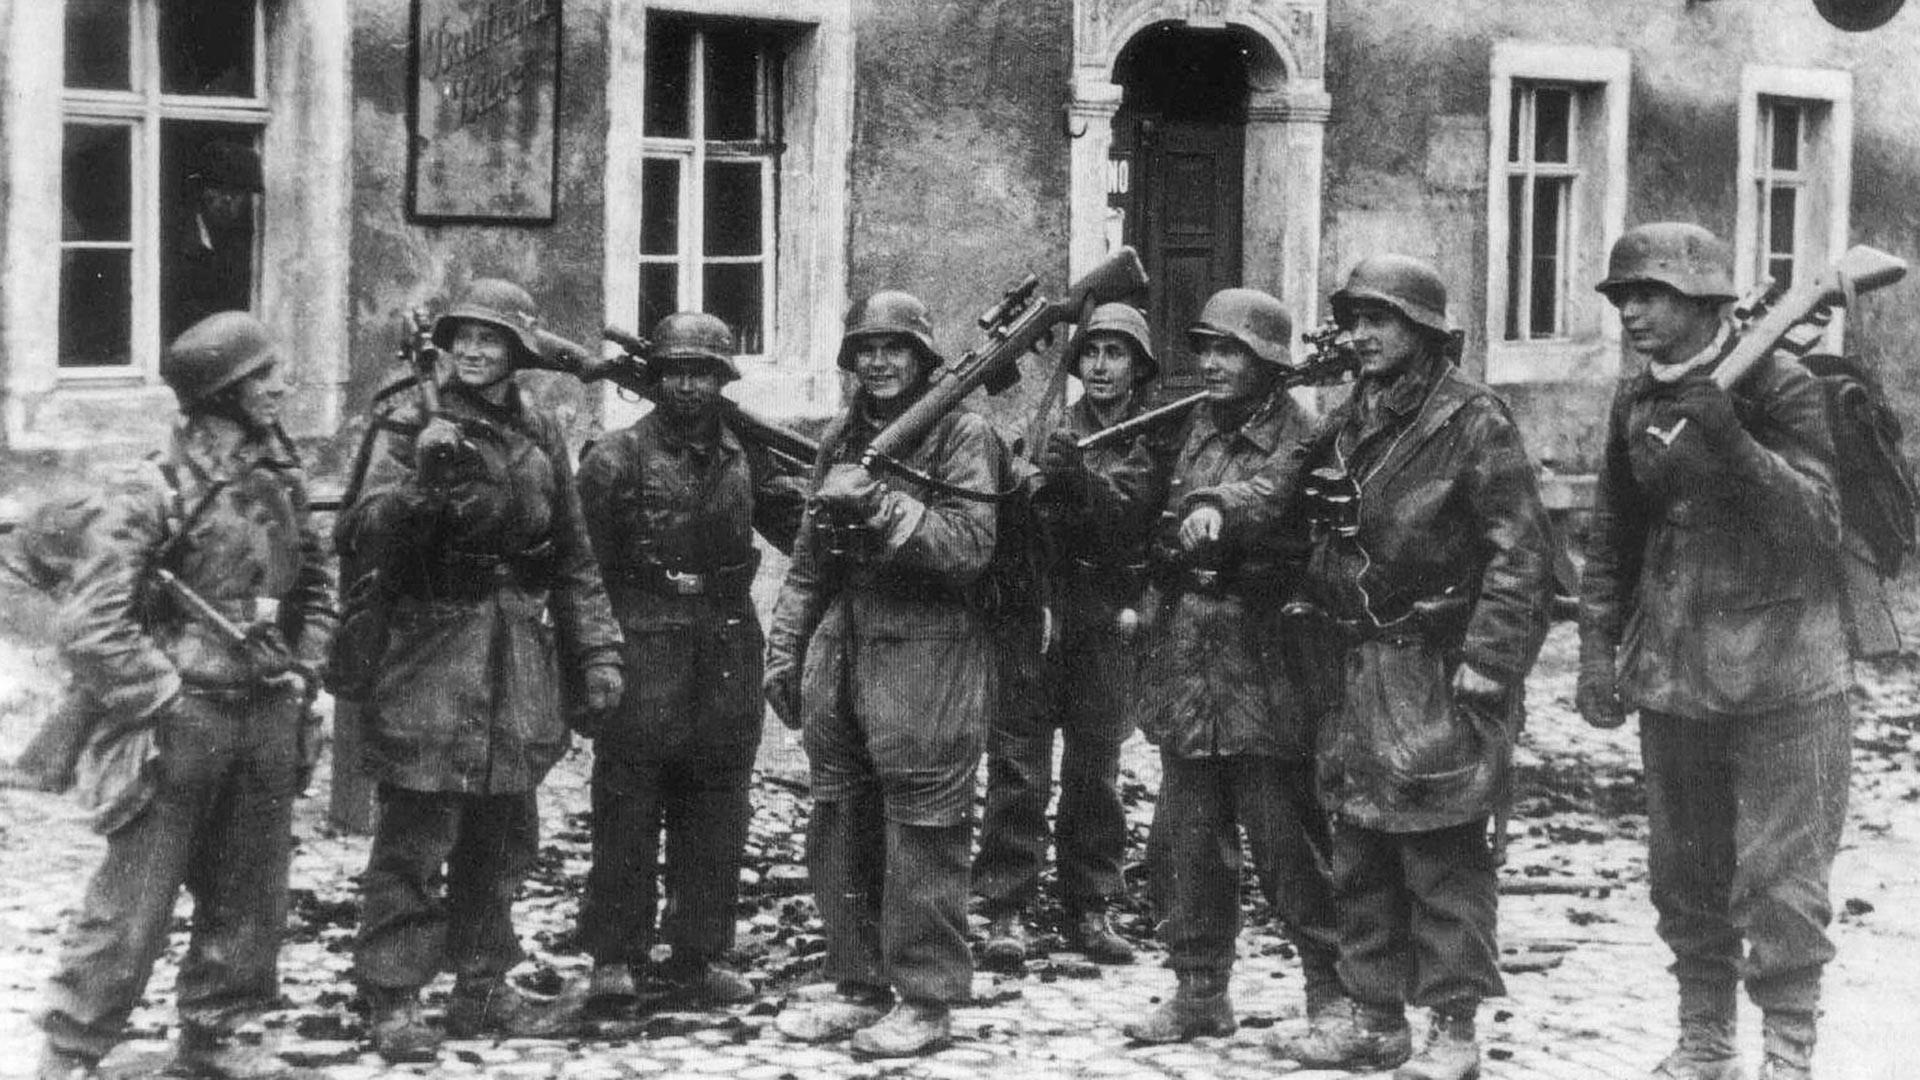 Des soldats du Corps Hermann Goering